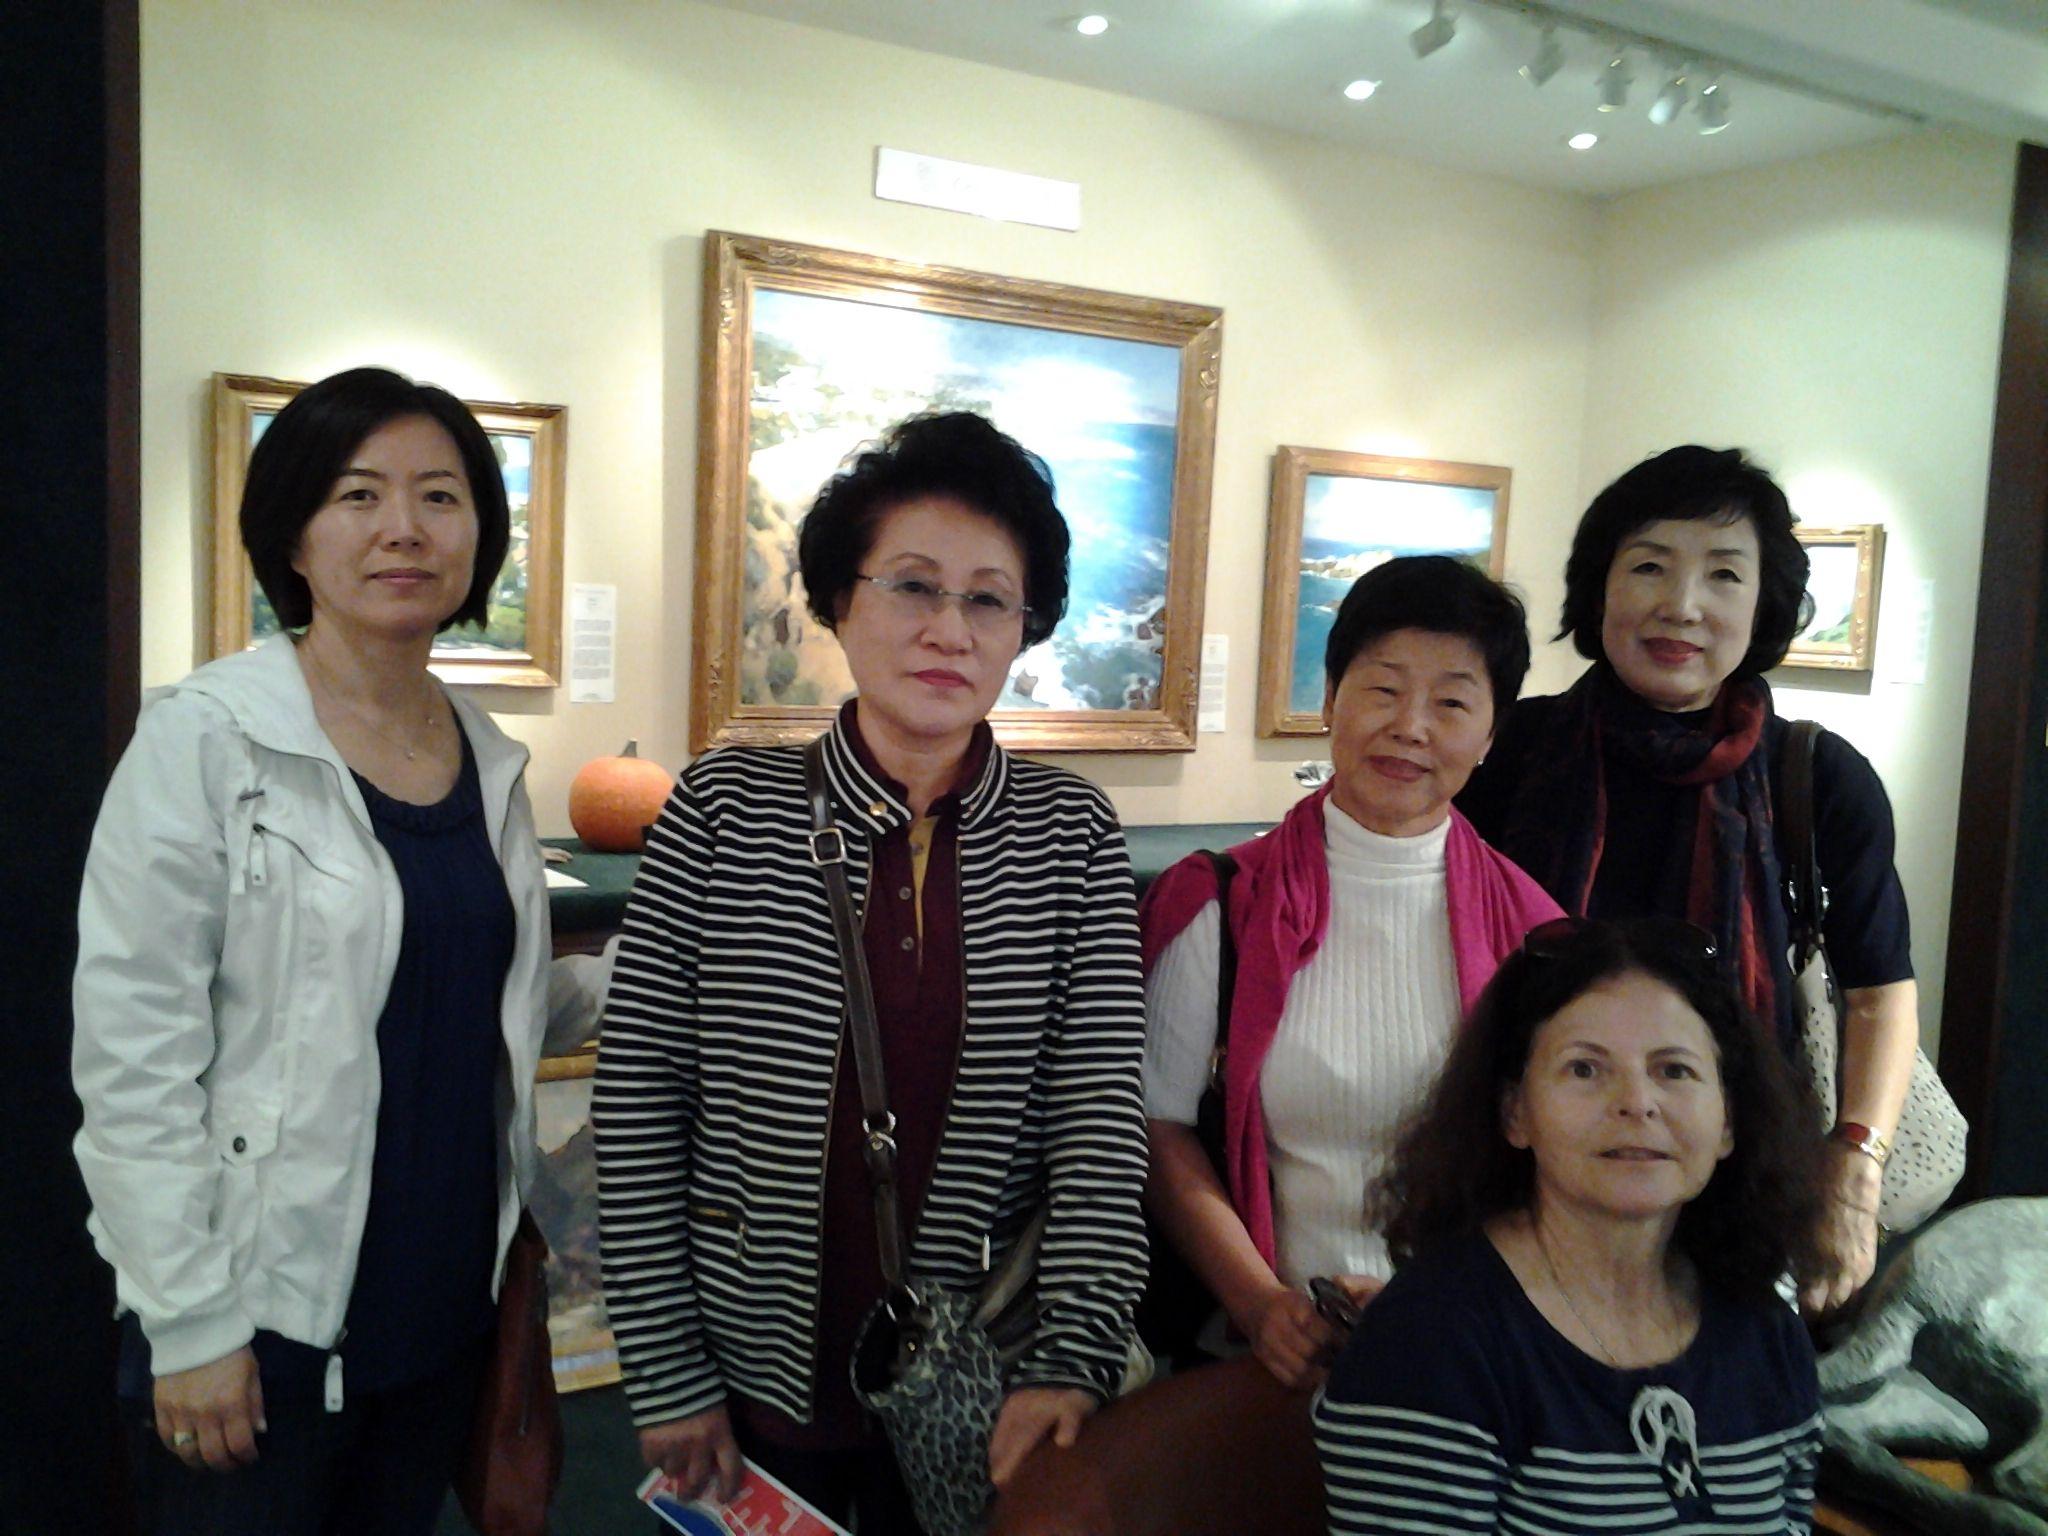 Touring Laguna Beach Museums in South Laguna